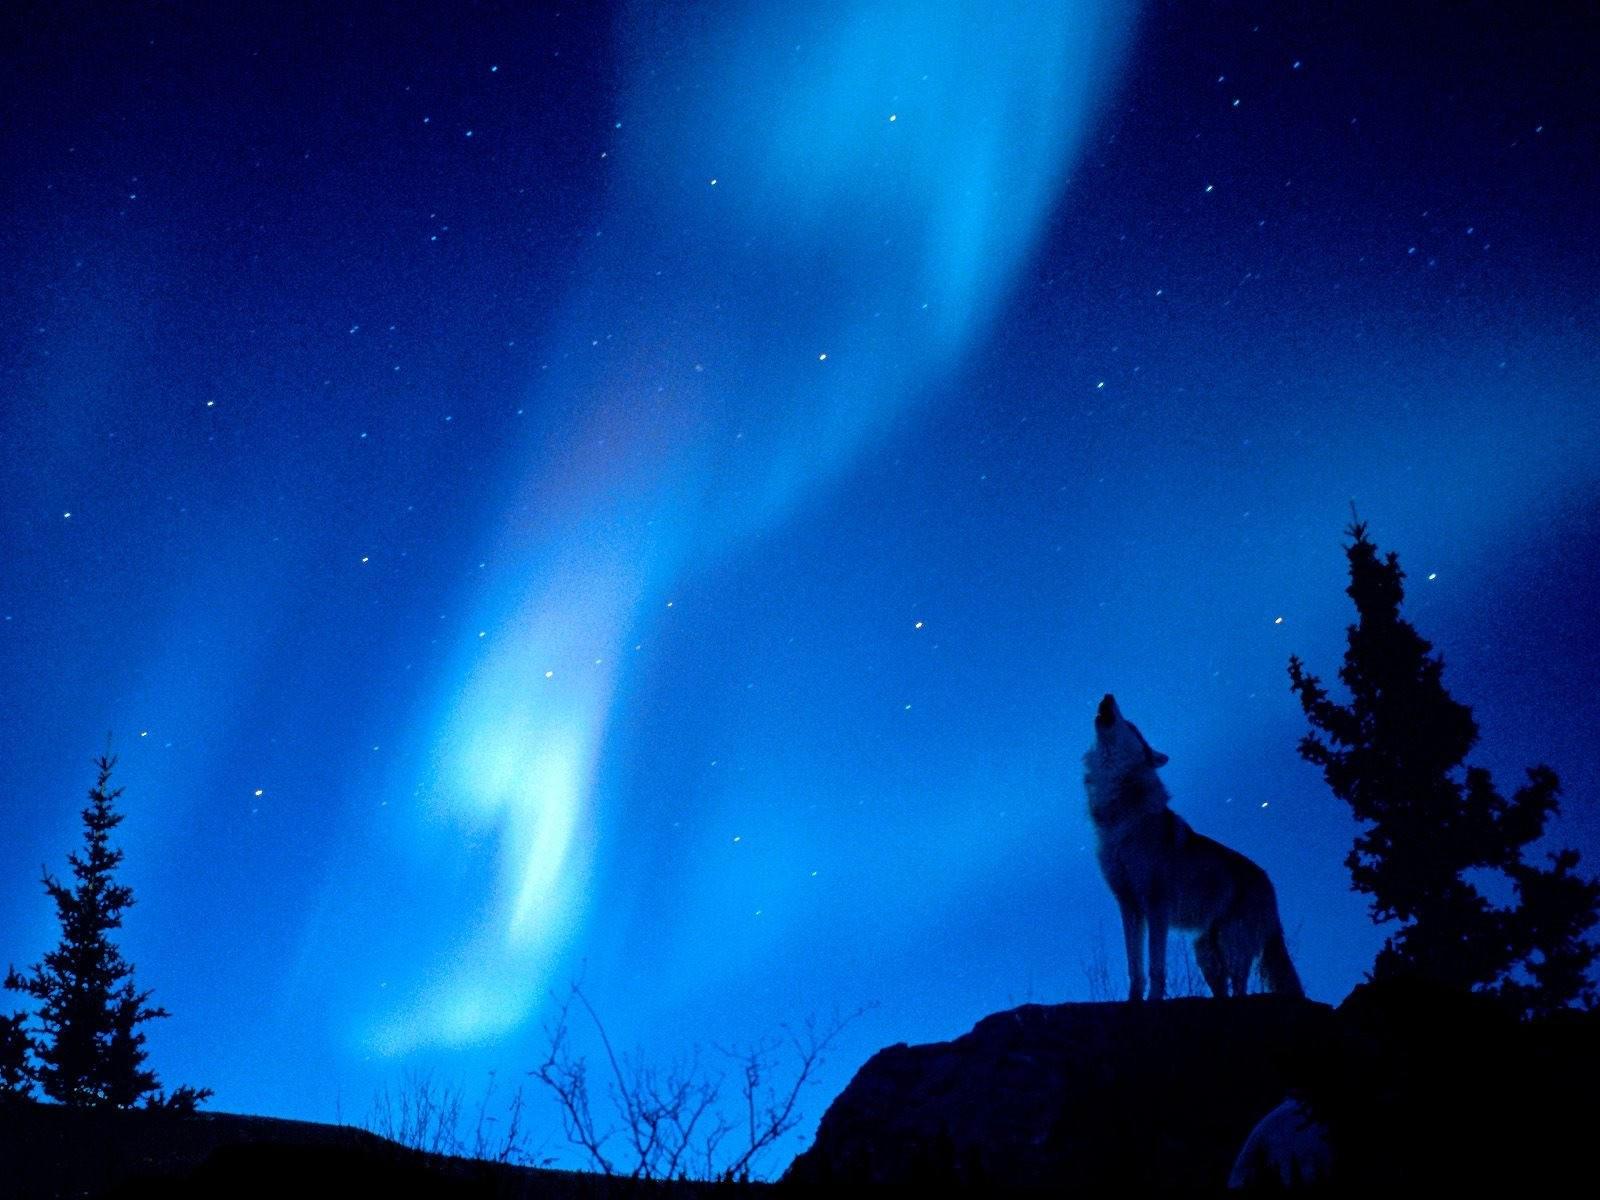 Волк воет на луну. Обои с животными, картинки, фото 1024x768